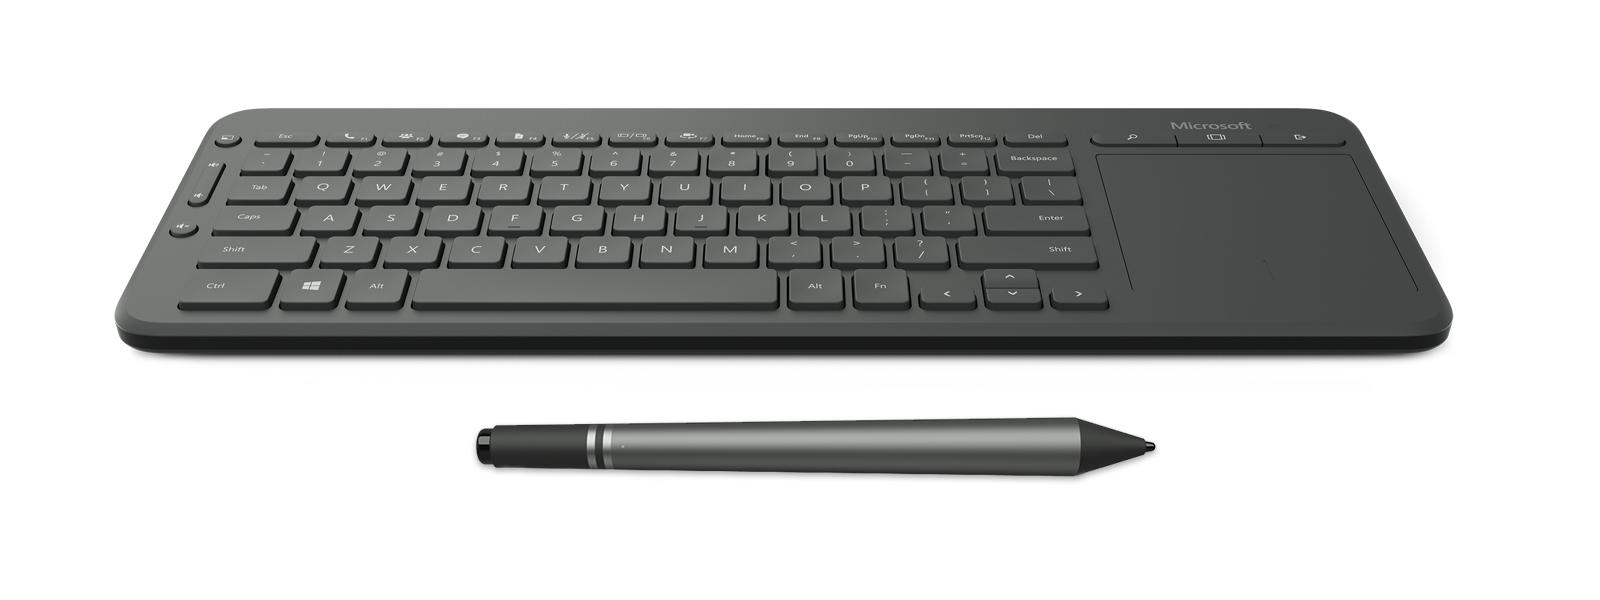 Keyboard en Pen die meegeleverd worden met Surface Hub.